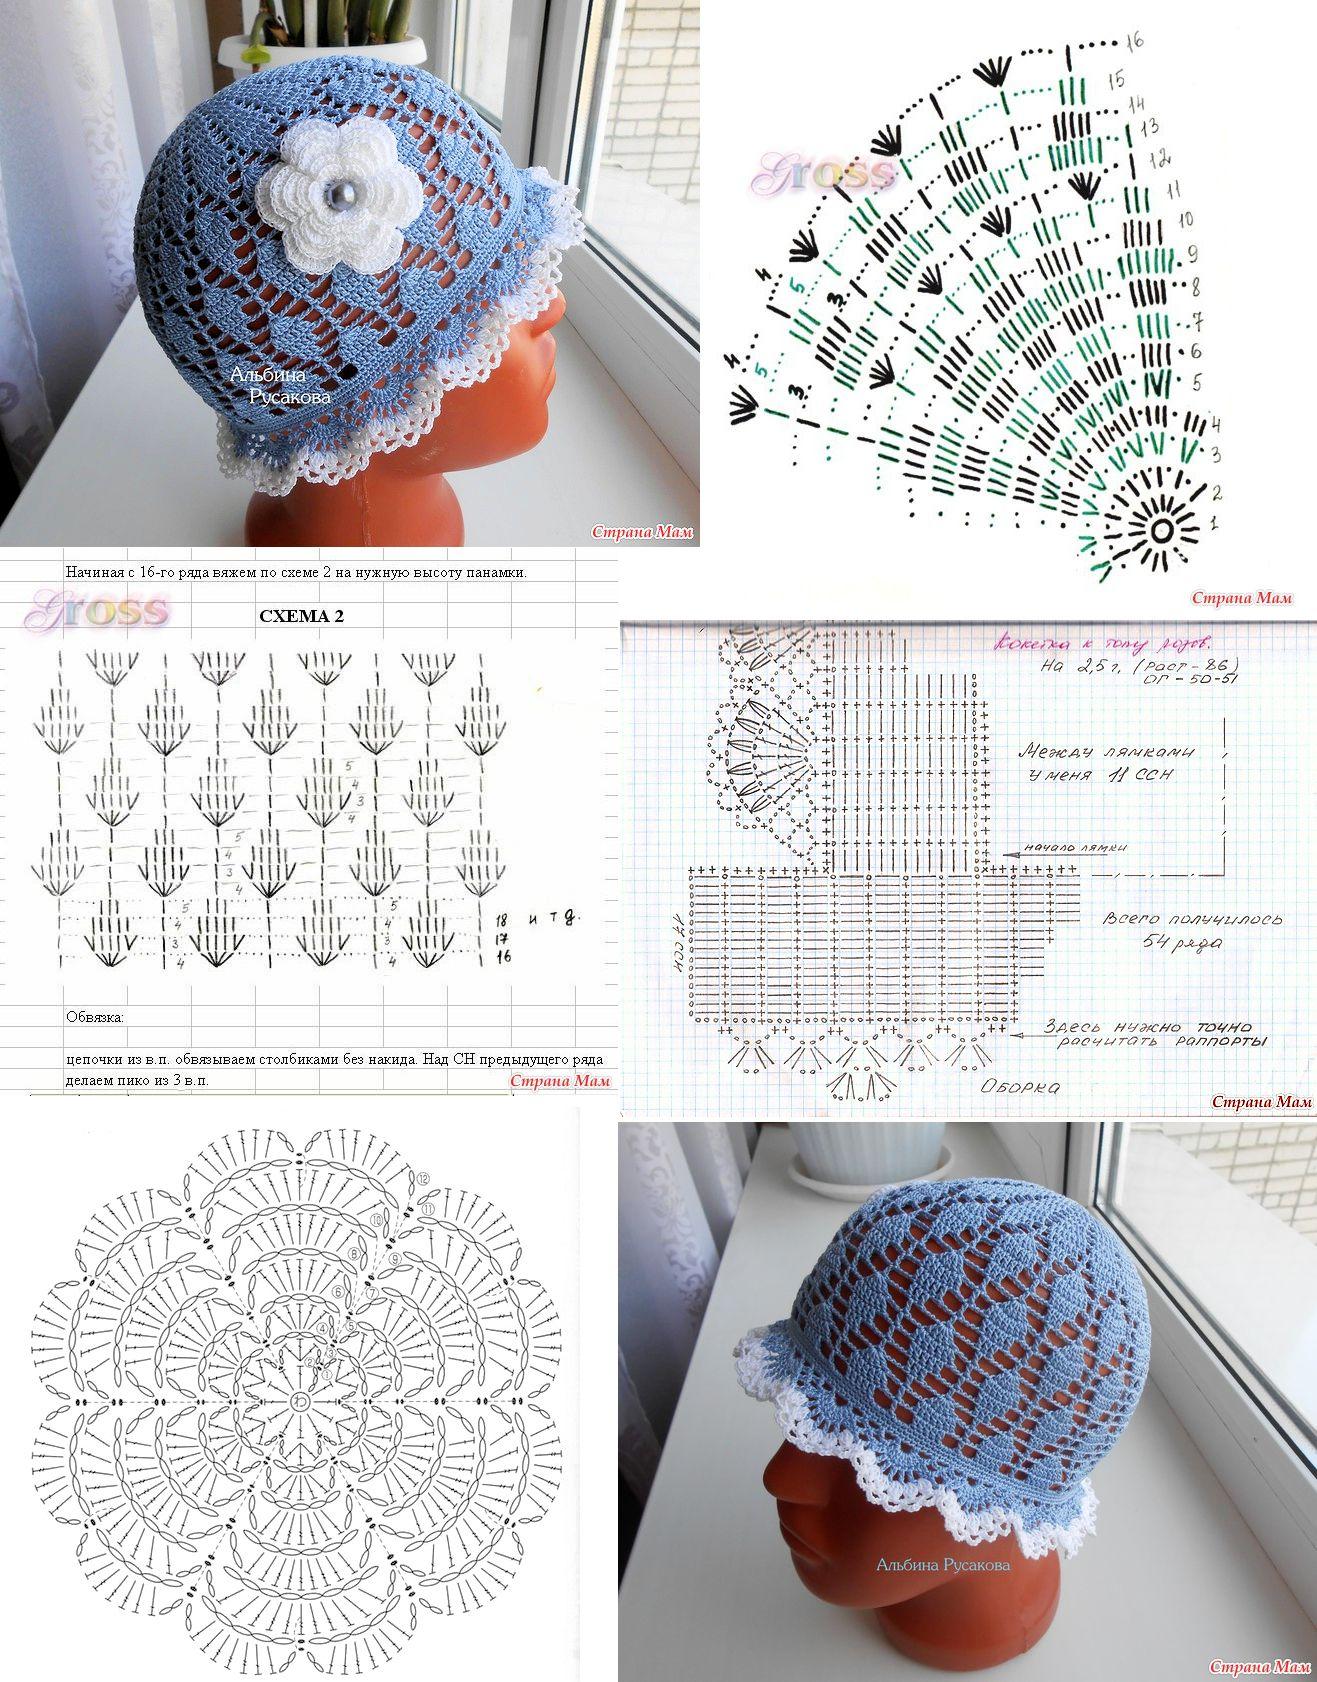 Crochet Summer Hat | Crochet Diagrams or Charts | Pinterest ...